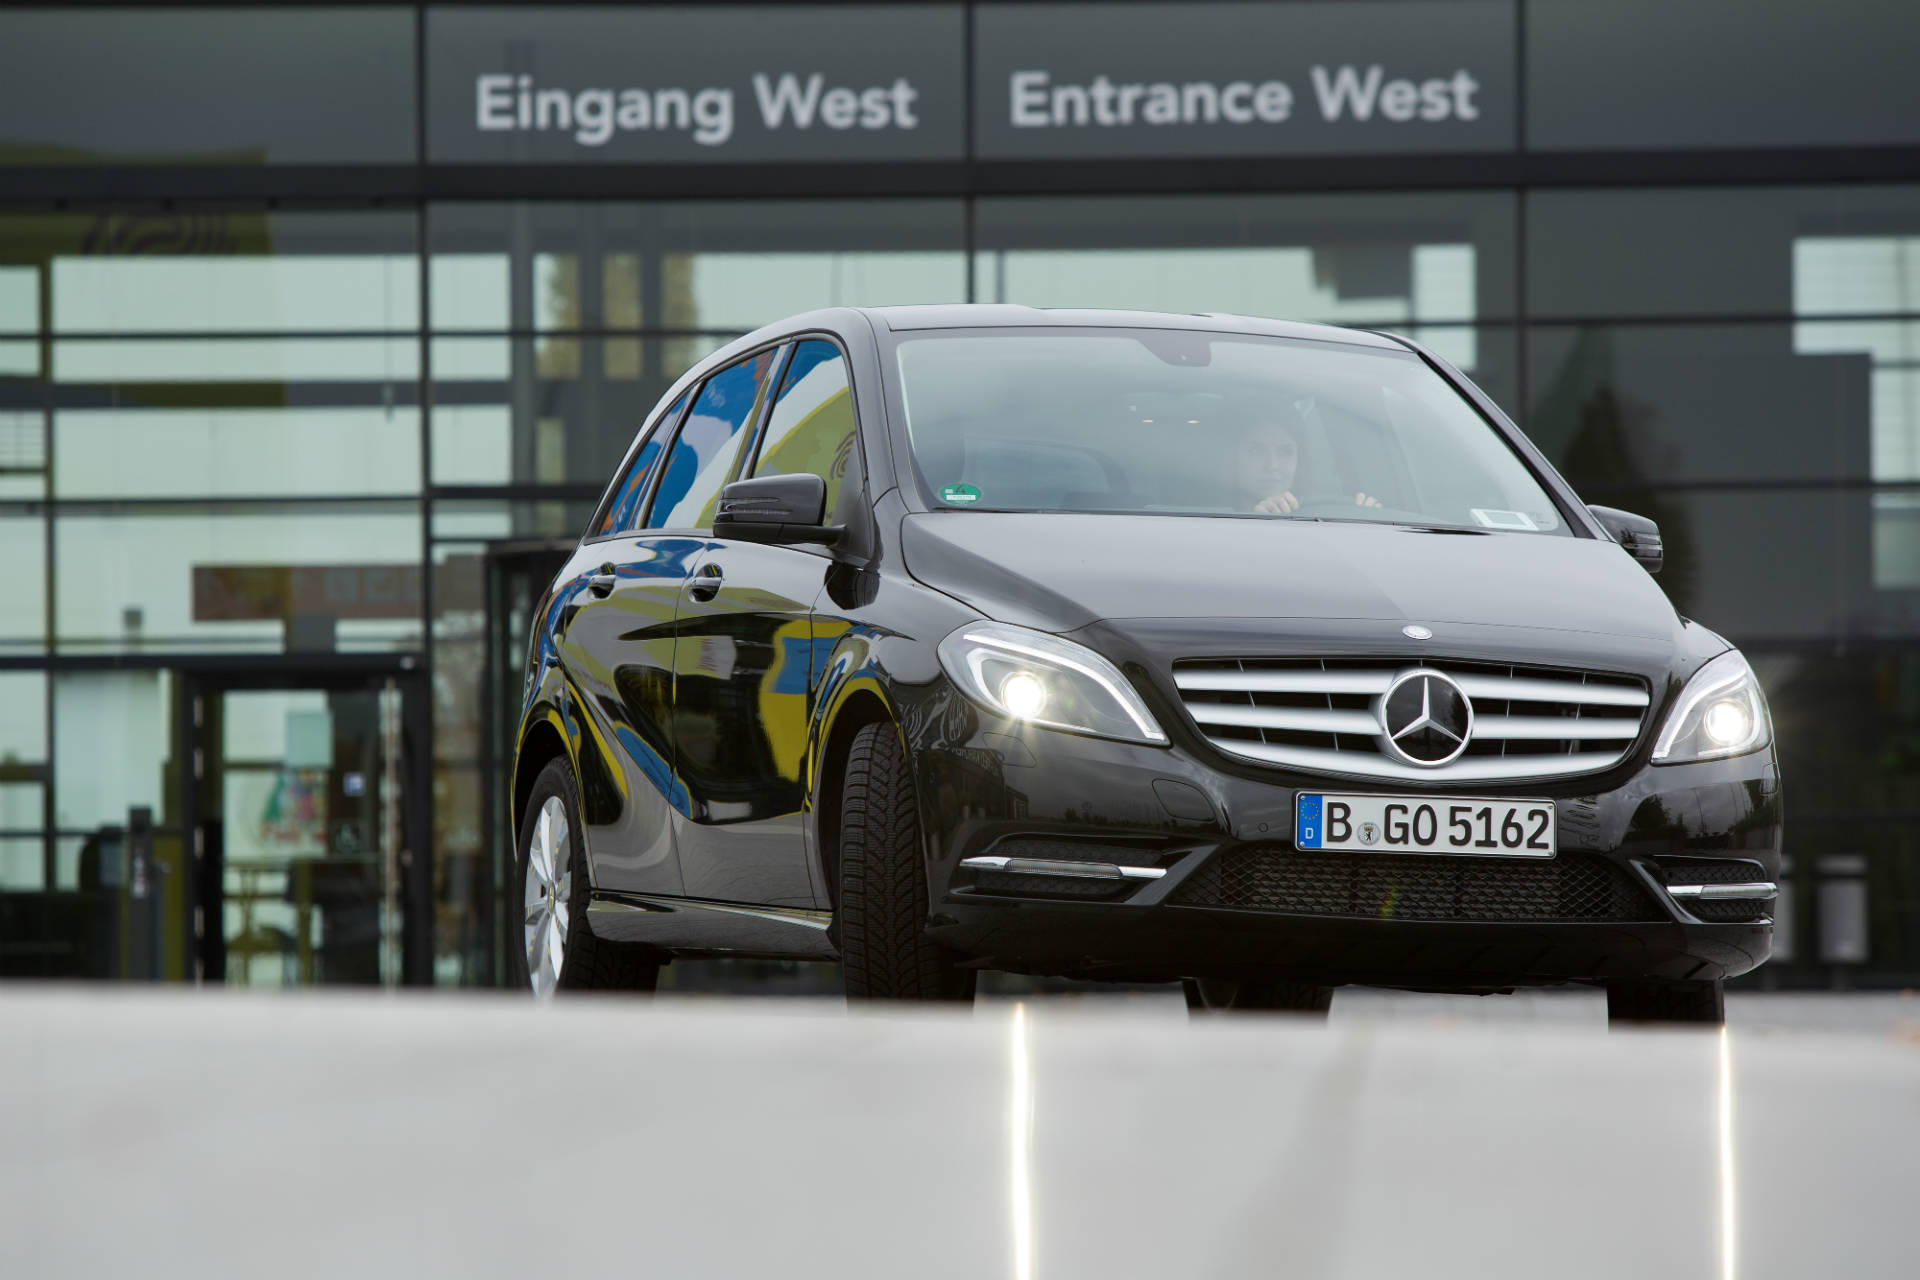 car2go black am Flughafen Stuttgart